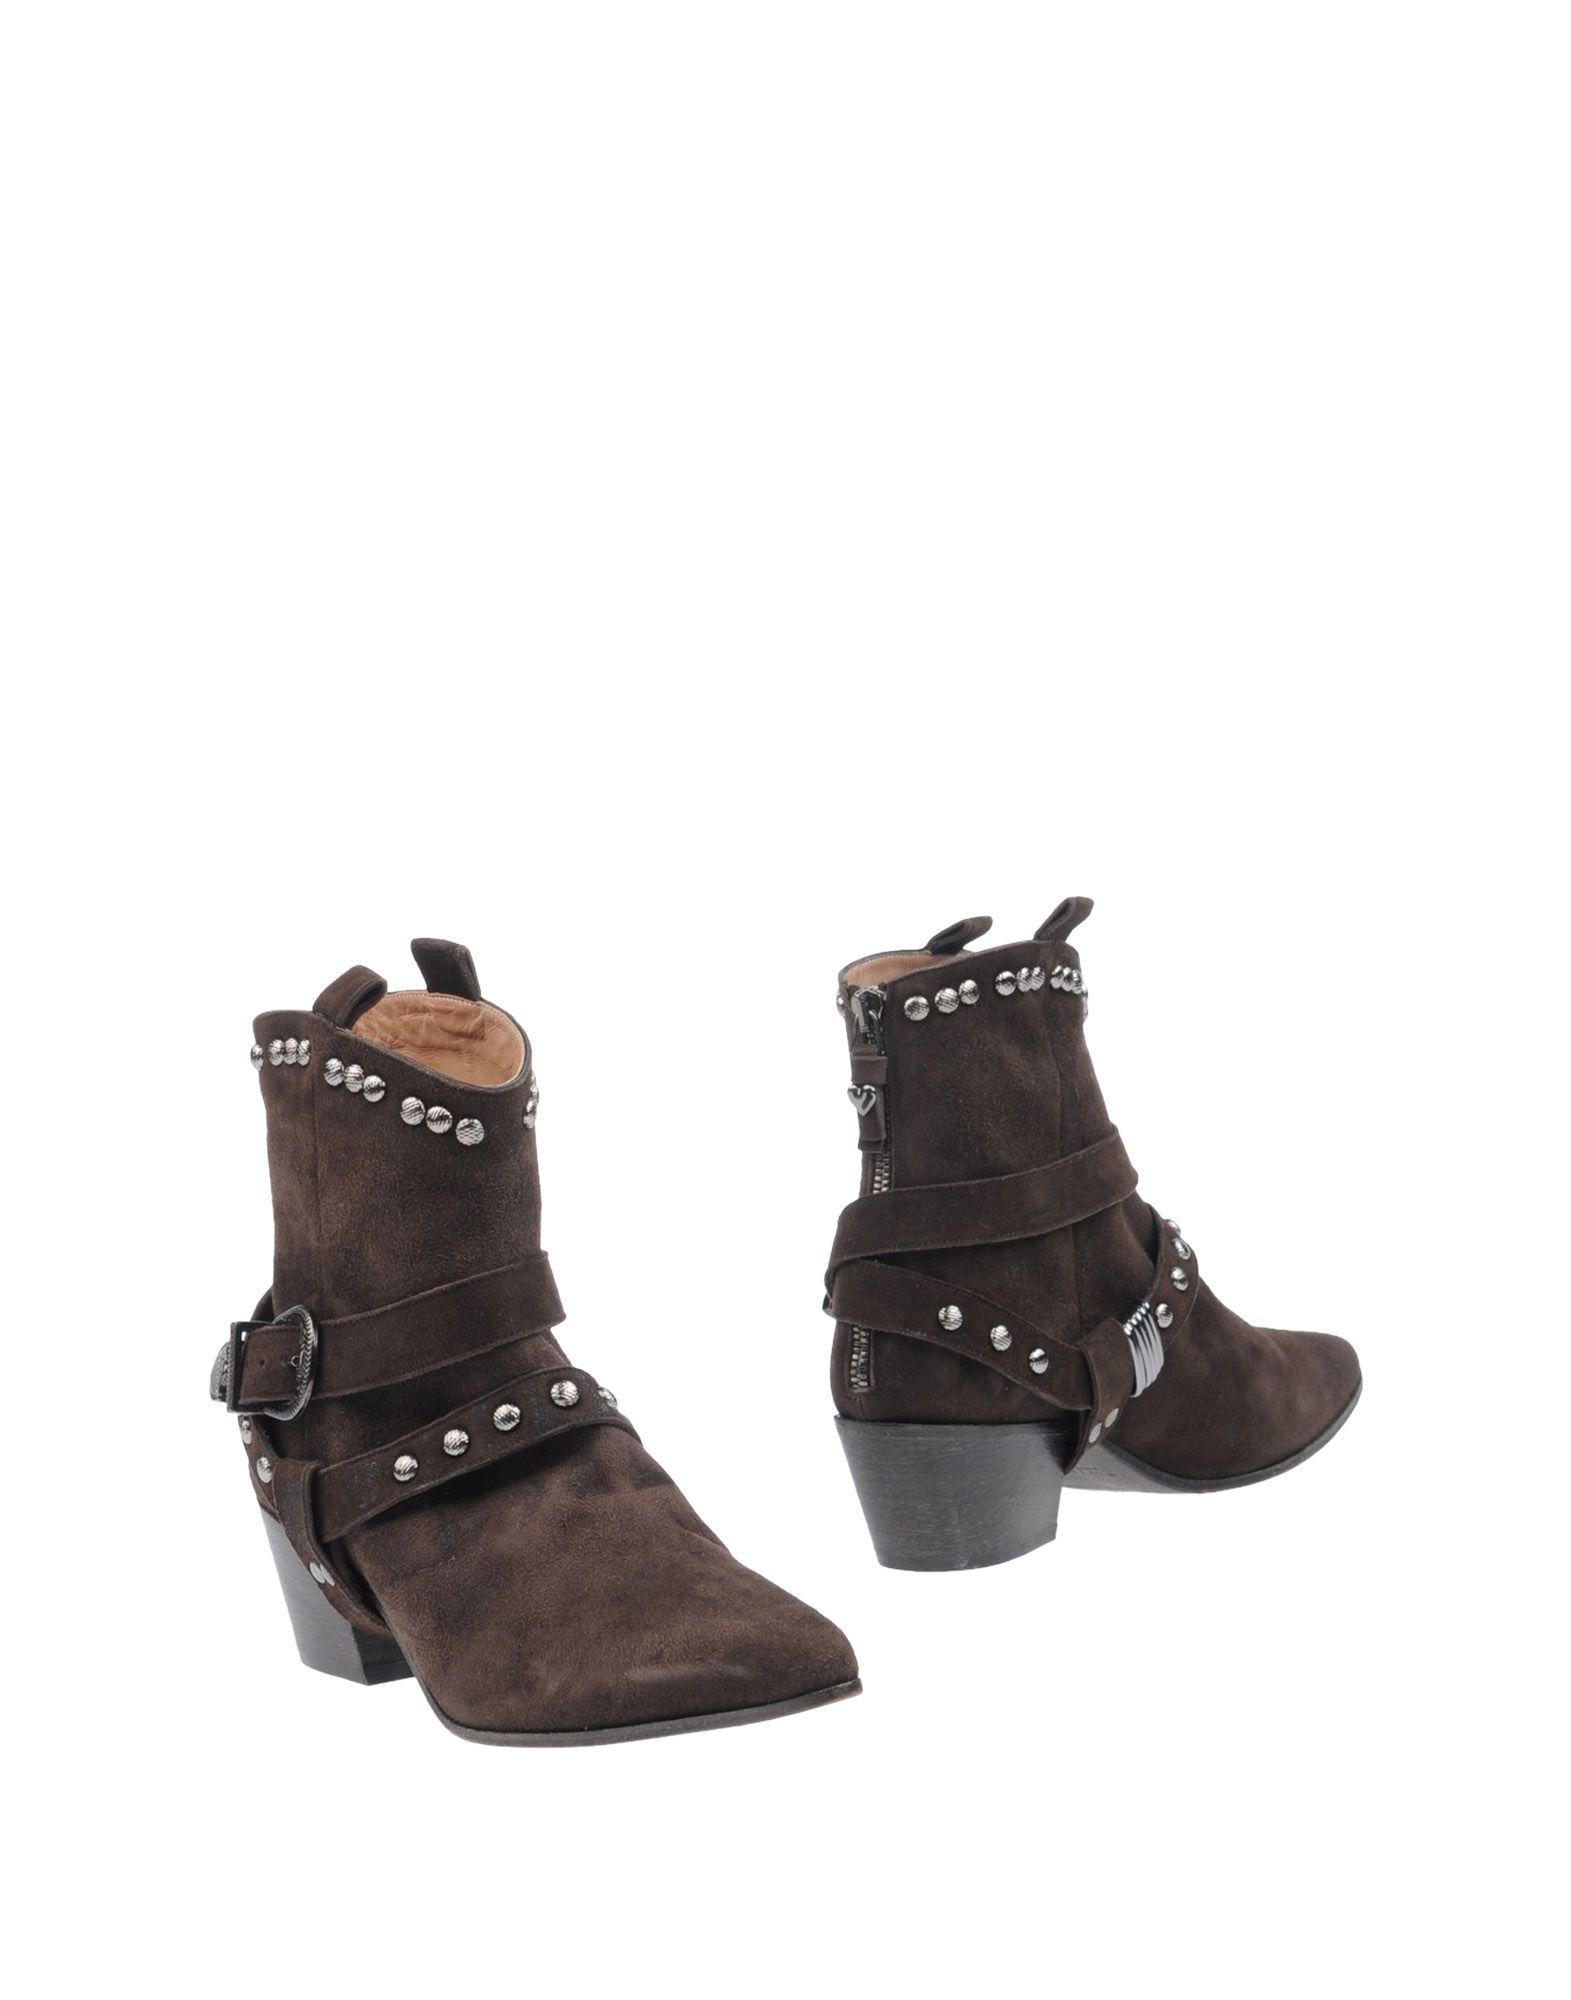 Haltbare Haltbare Haltbare Mode billige Schuhe Twin 11244557GL Beliebte Schuhe 5680e4